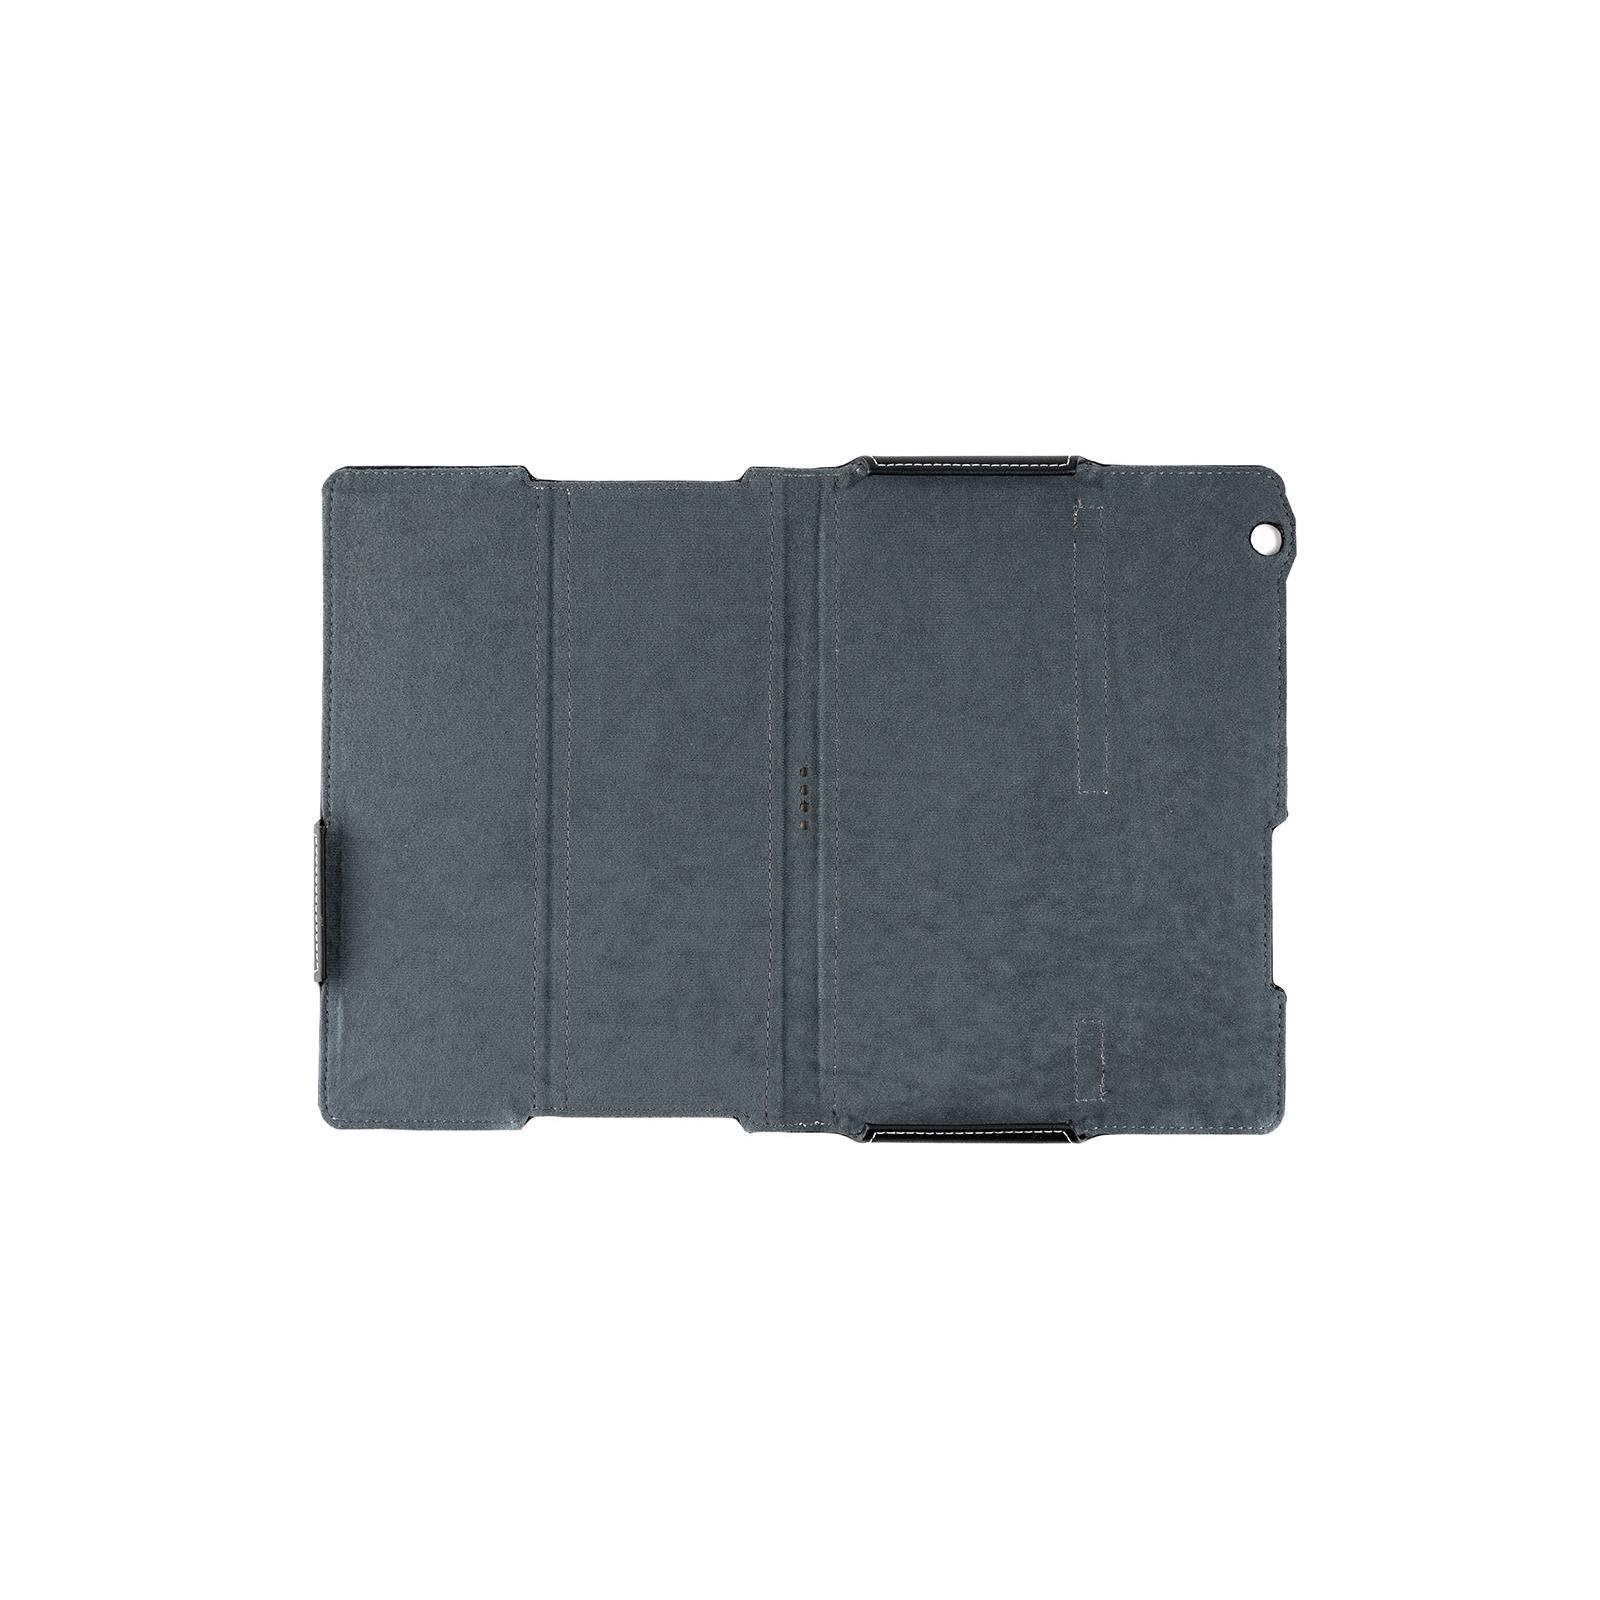 Чехол для планшета Huawei MediaPad T3 10 black Vinga (VNT3753010) изображение 6